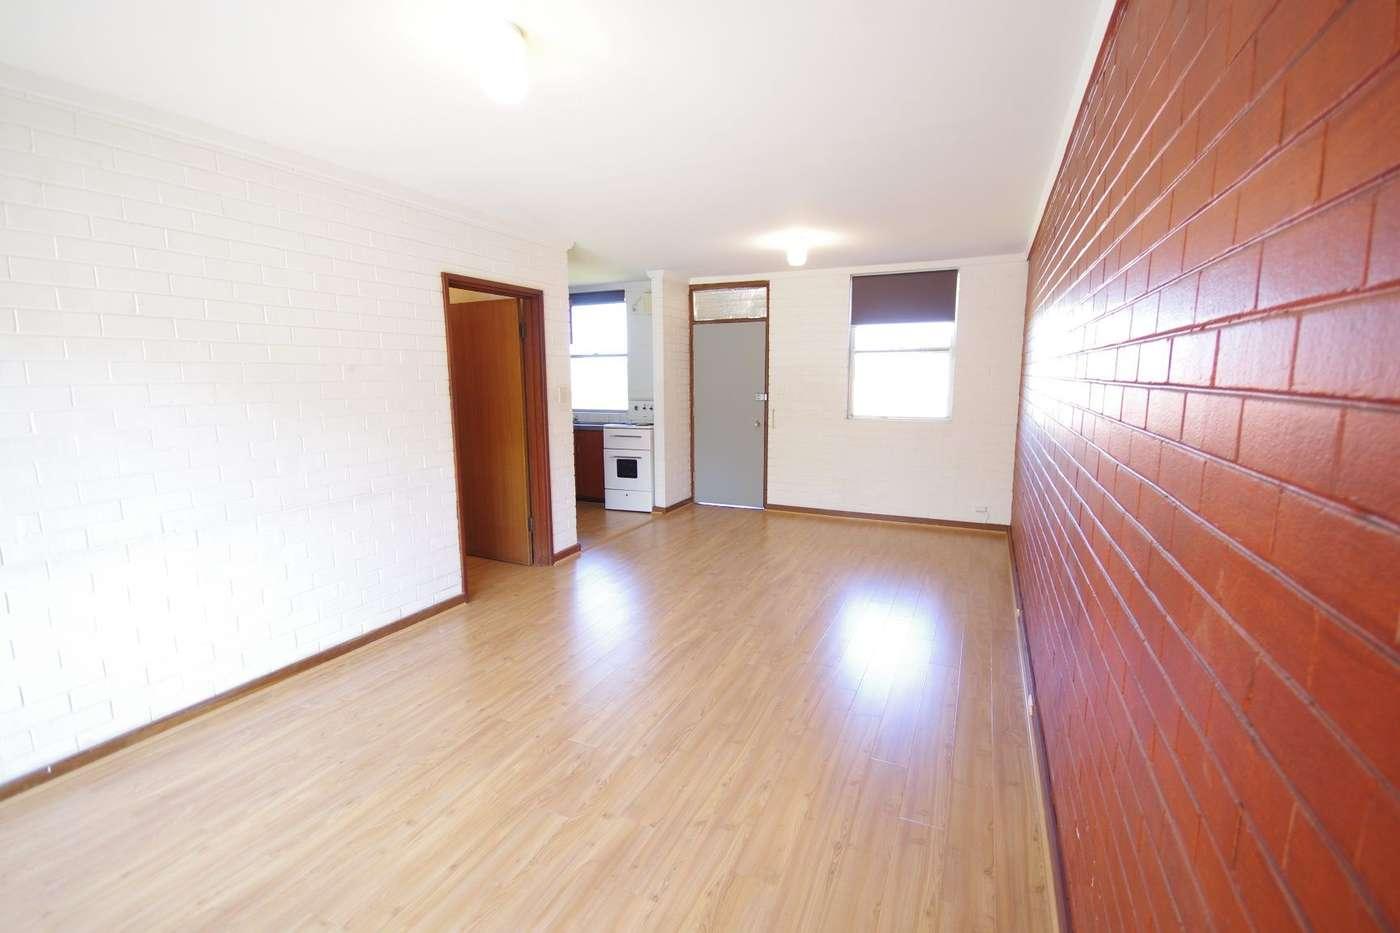 Main view of Homely house listing, 17/20 Blythe Avenue, Yokine, WA 6060